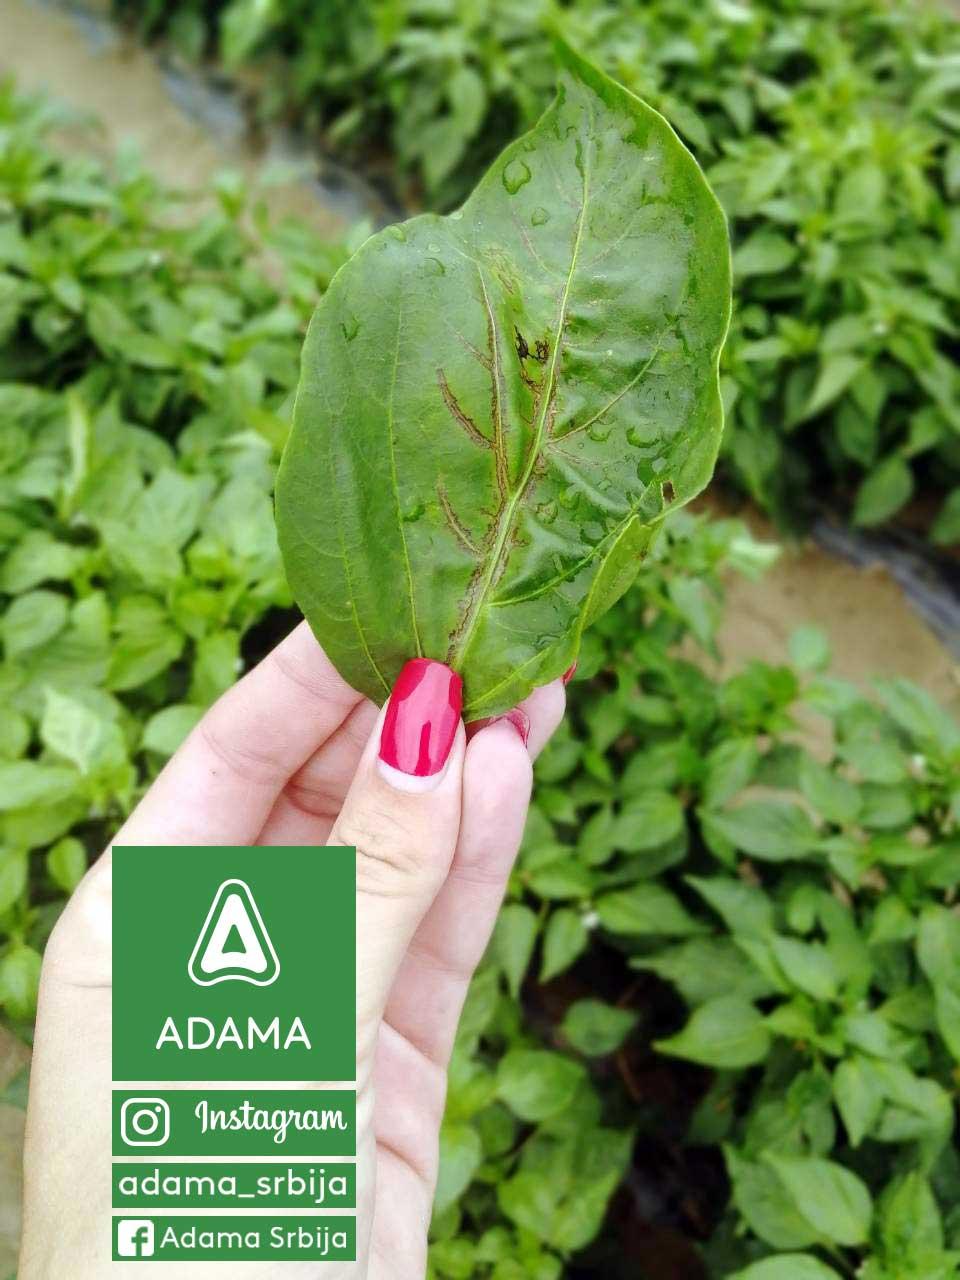 Agrosaveti---Adama---Povce---Paprika---Virusi-02